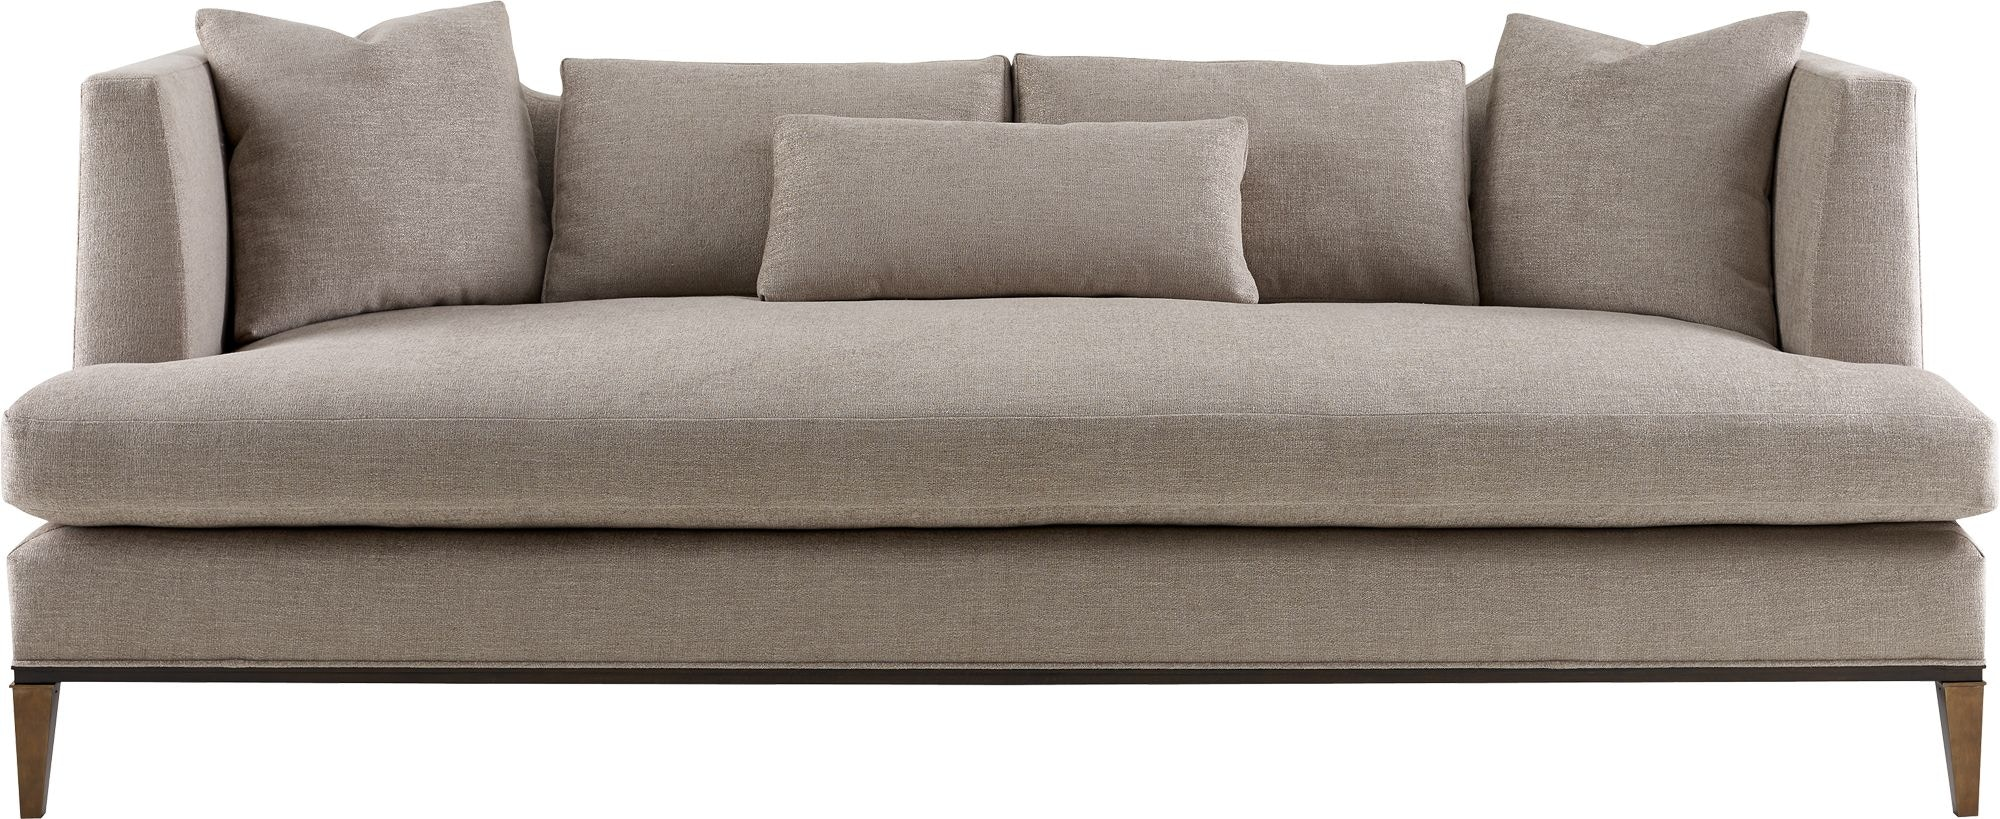 baker furniture max sofa manufacturers nottingham uk barbara barry thacher sectional